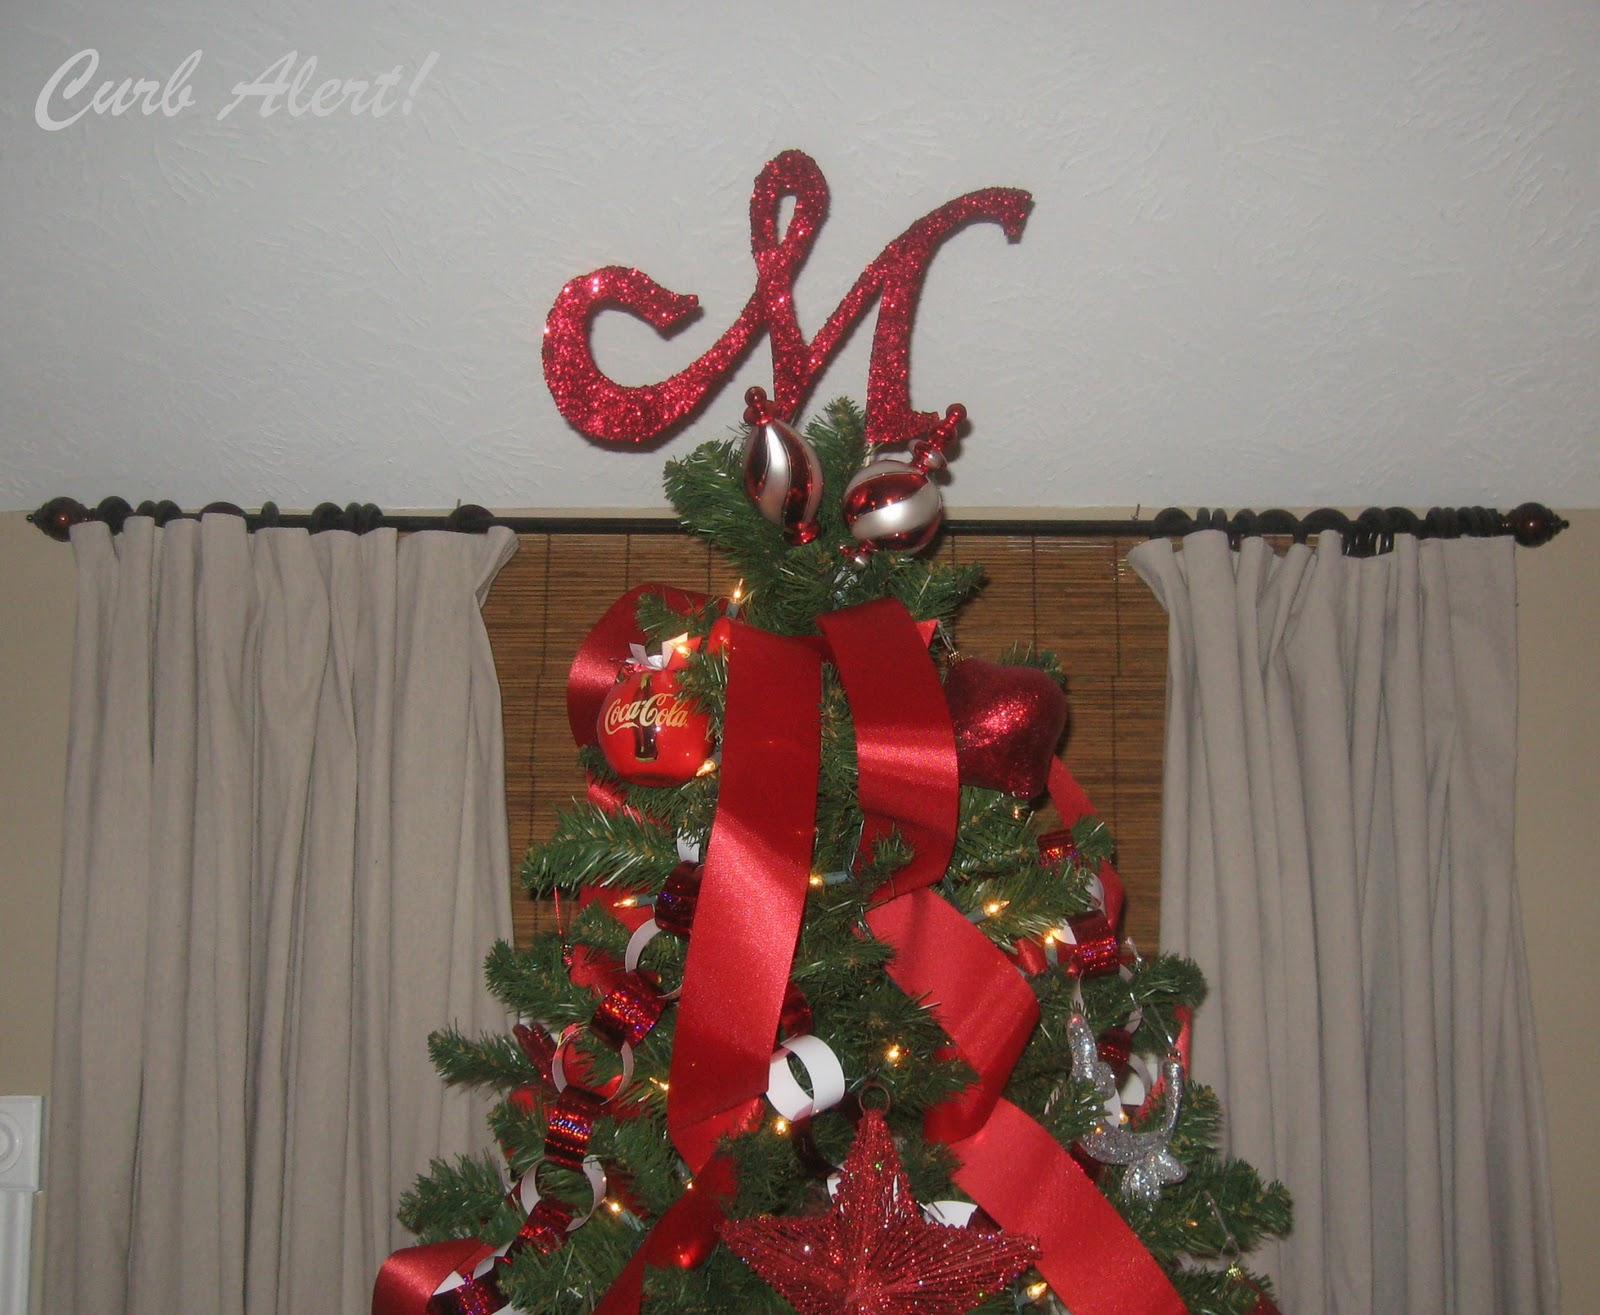 Curb Alert! : Glittery Monogram Tree Topper